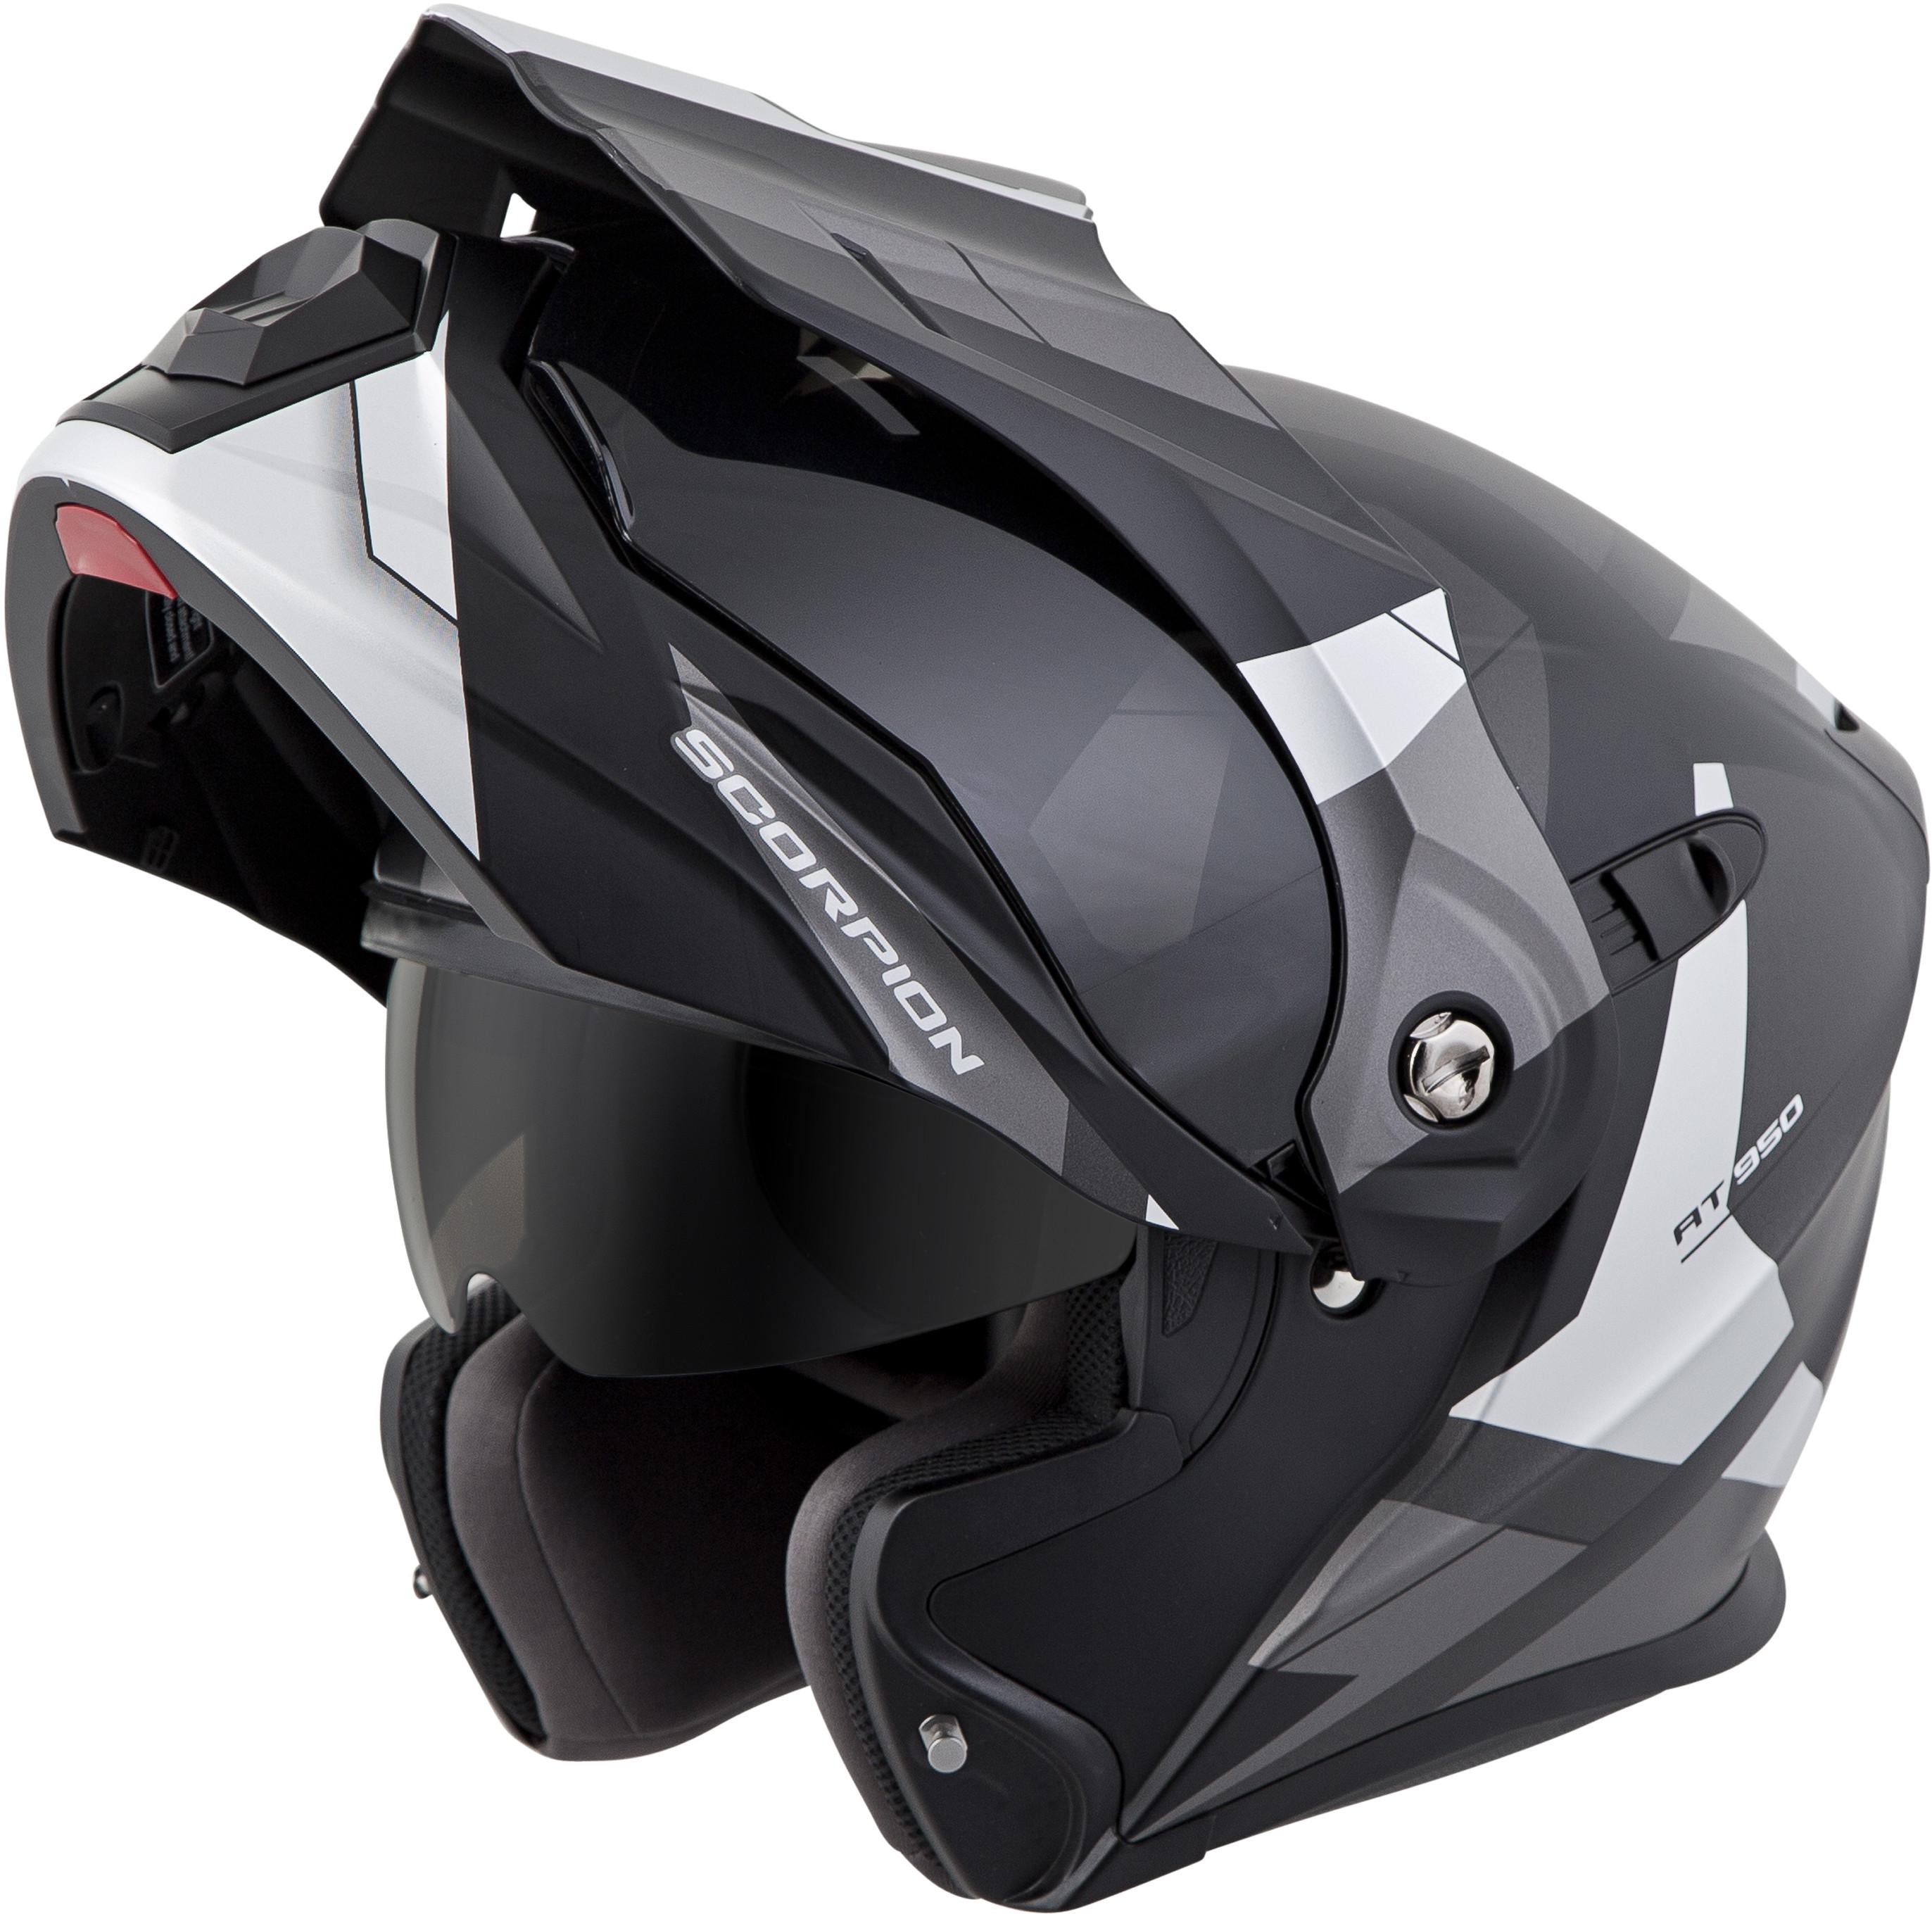 for-Scorpion-Helmet-EXO-AT950-Neocon-Snow-Helmet-with-Dual-Lens-Shield miniature 27